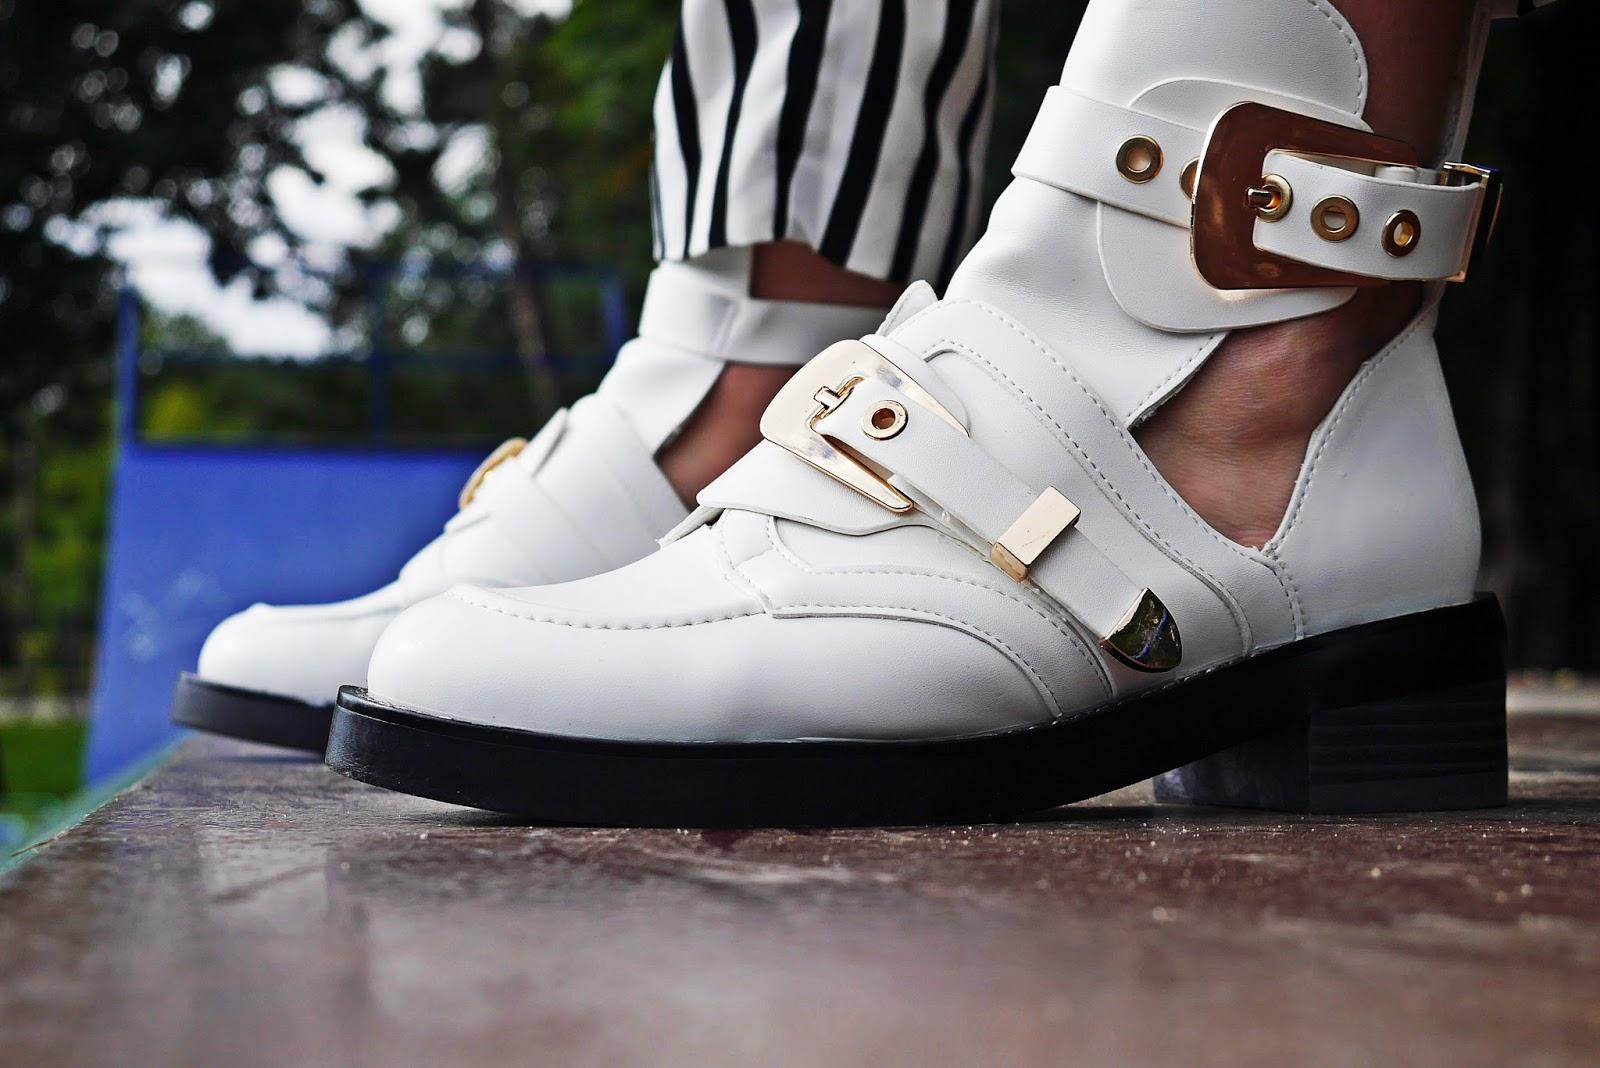 5_balenciaga_white_Ceinture_Ankle_Boots_stripes_pants_black_jacket_karyn_blog_modowy_280917dfg